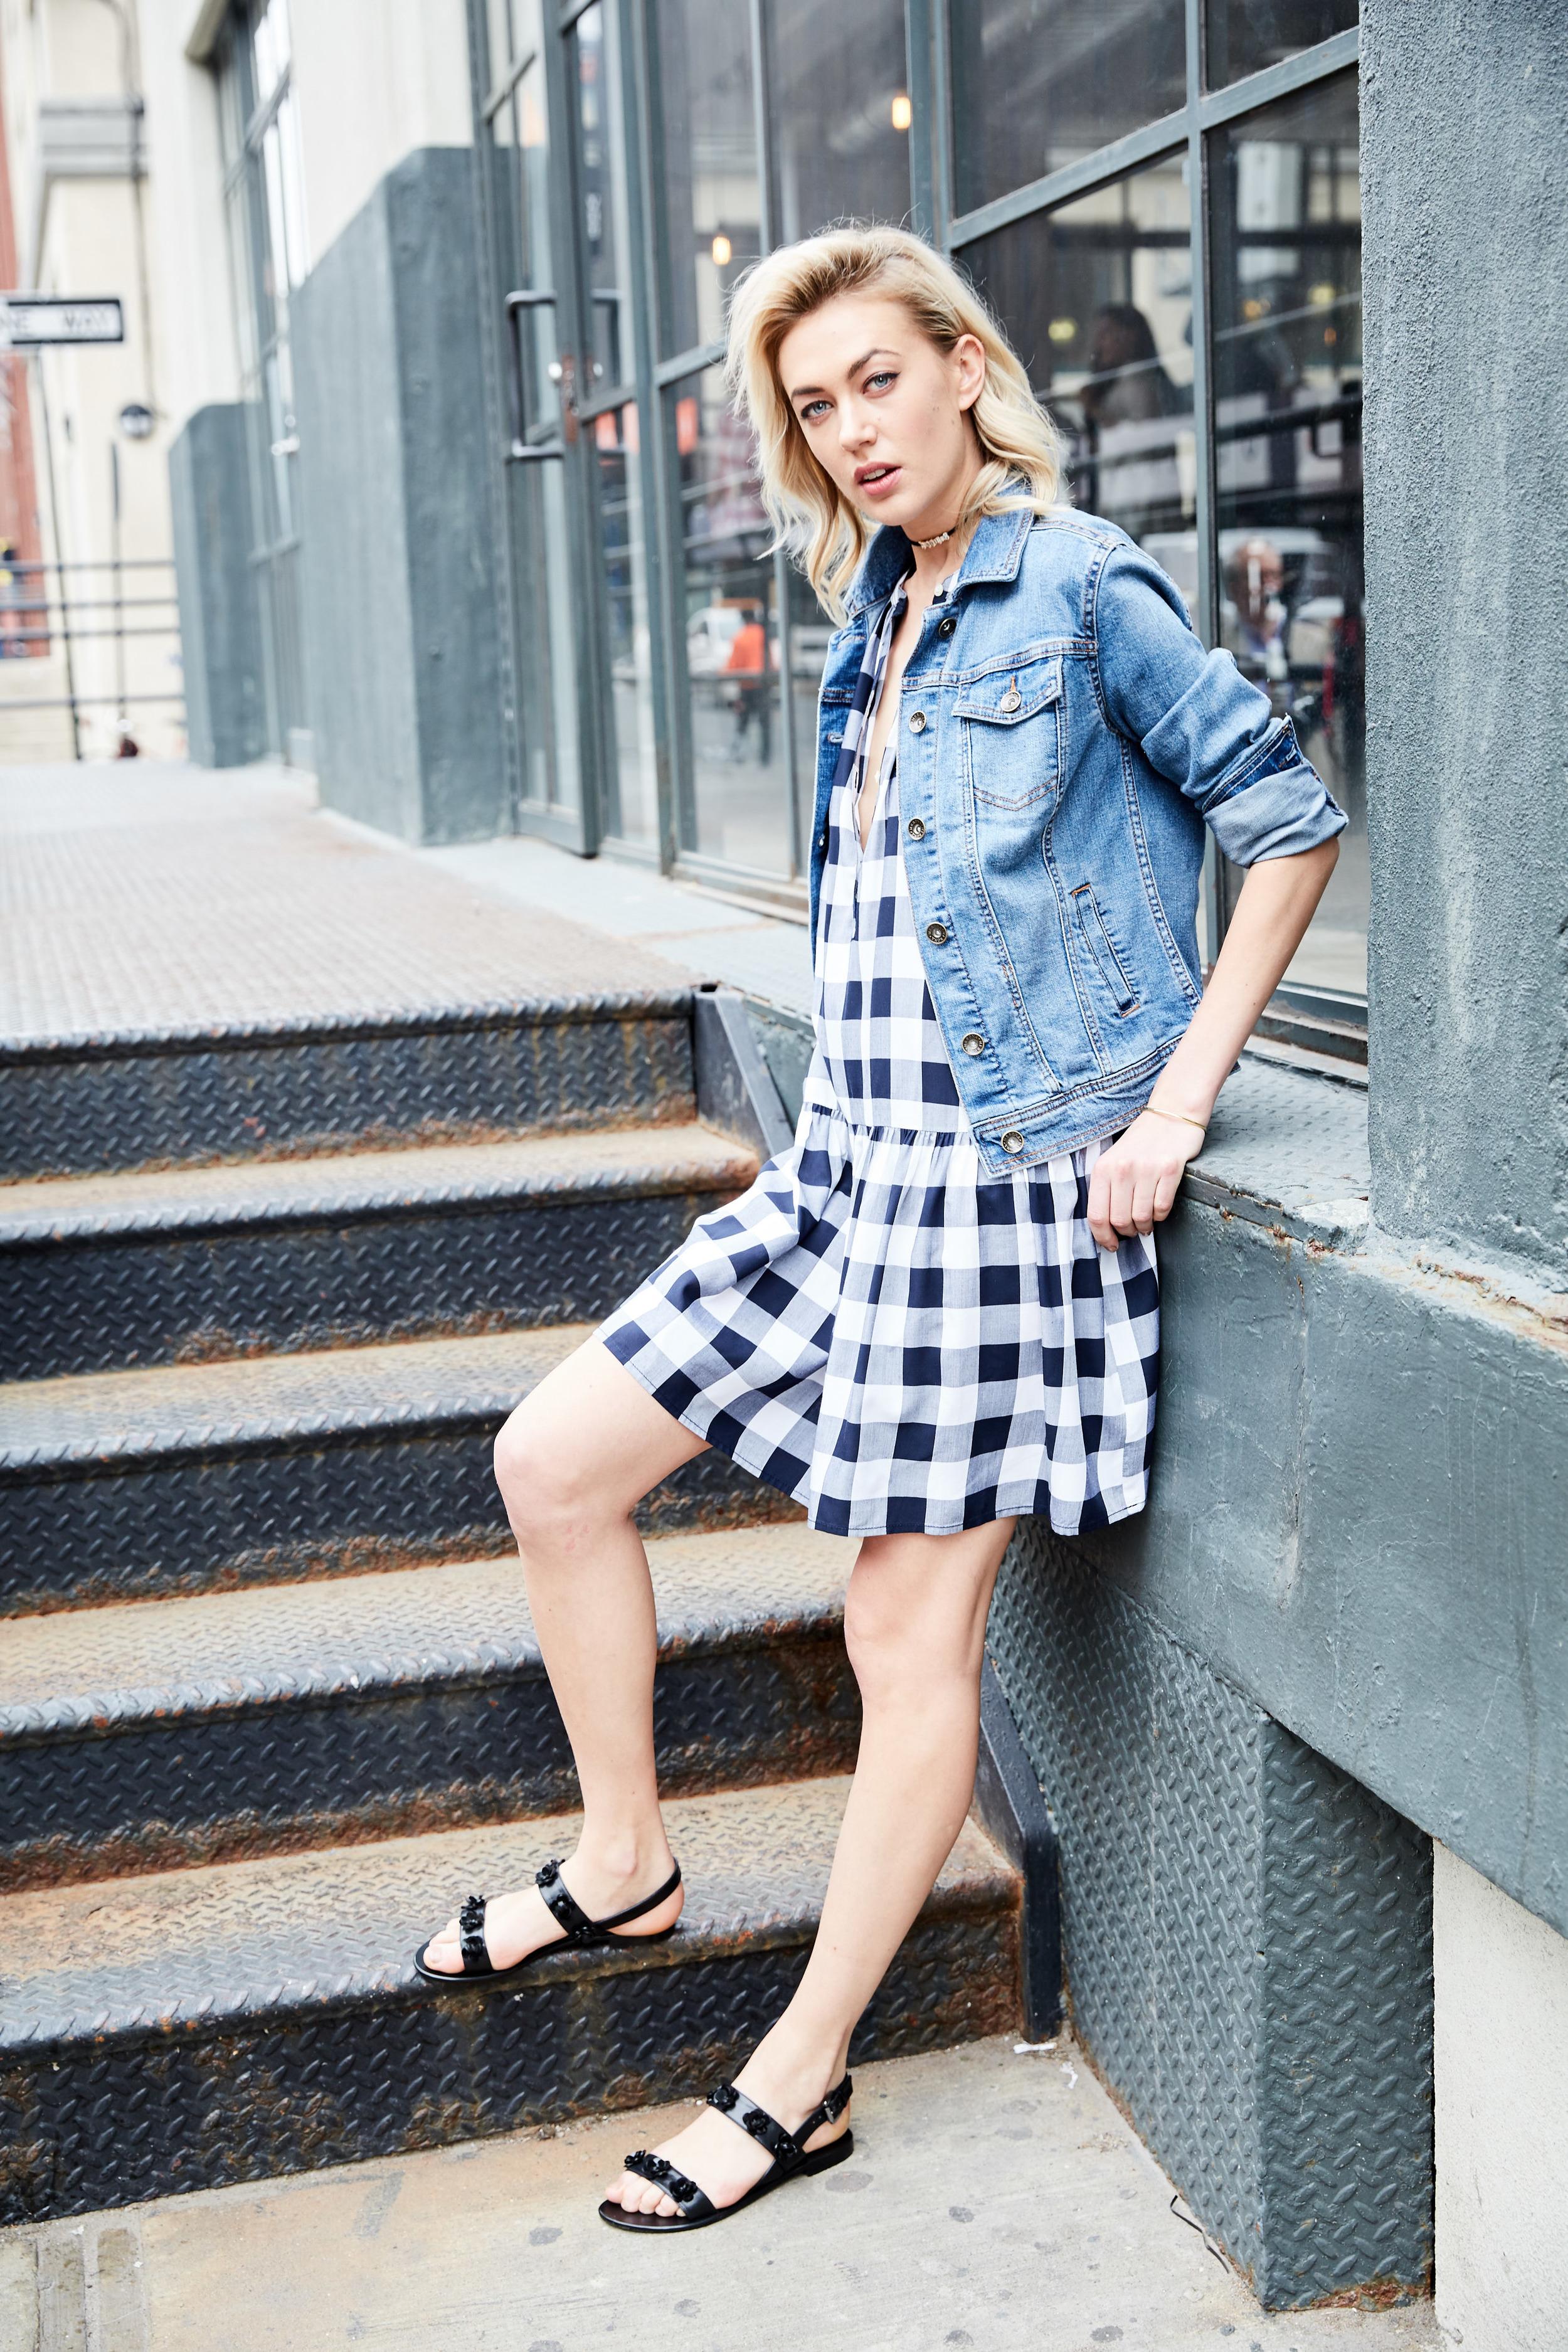 LOFT dress, $69.50;  loft.com . Merona jacket, $29.99;  target.com . BECK Jewels choker, $89;  beckjewels.com . Dune London sandals, $60;  dunelondon.com . April Soderstrom bracelet, $48 (for set of 3);  aprilsoderstrom.com .